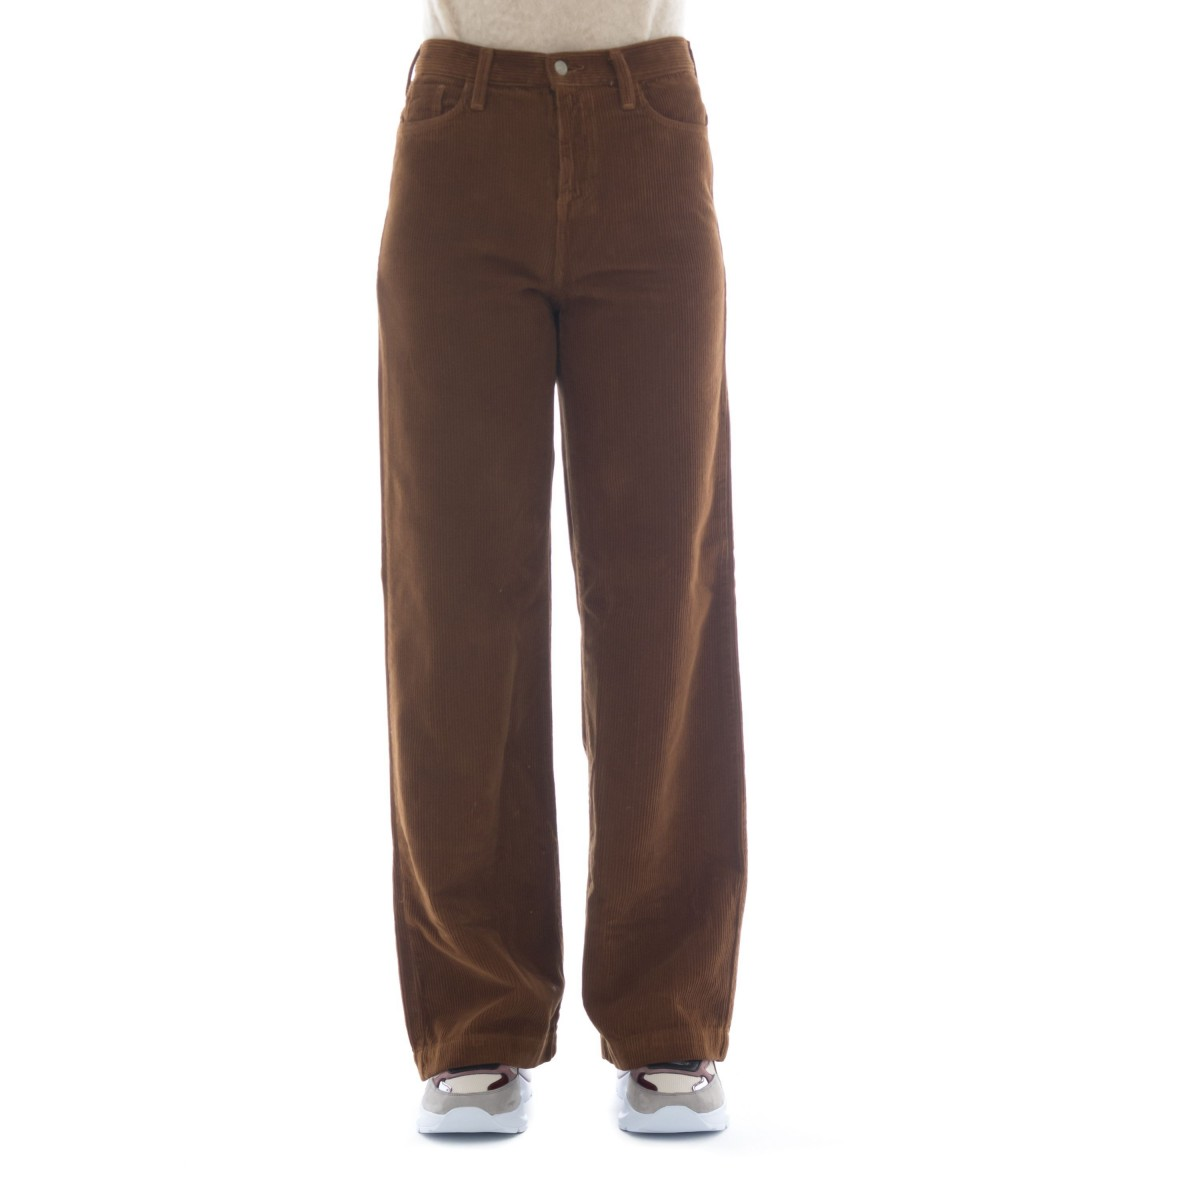 Pantalone donna - Marta corduroy pantalone largo velluto